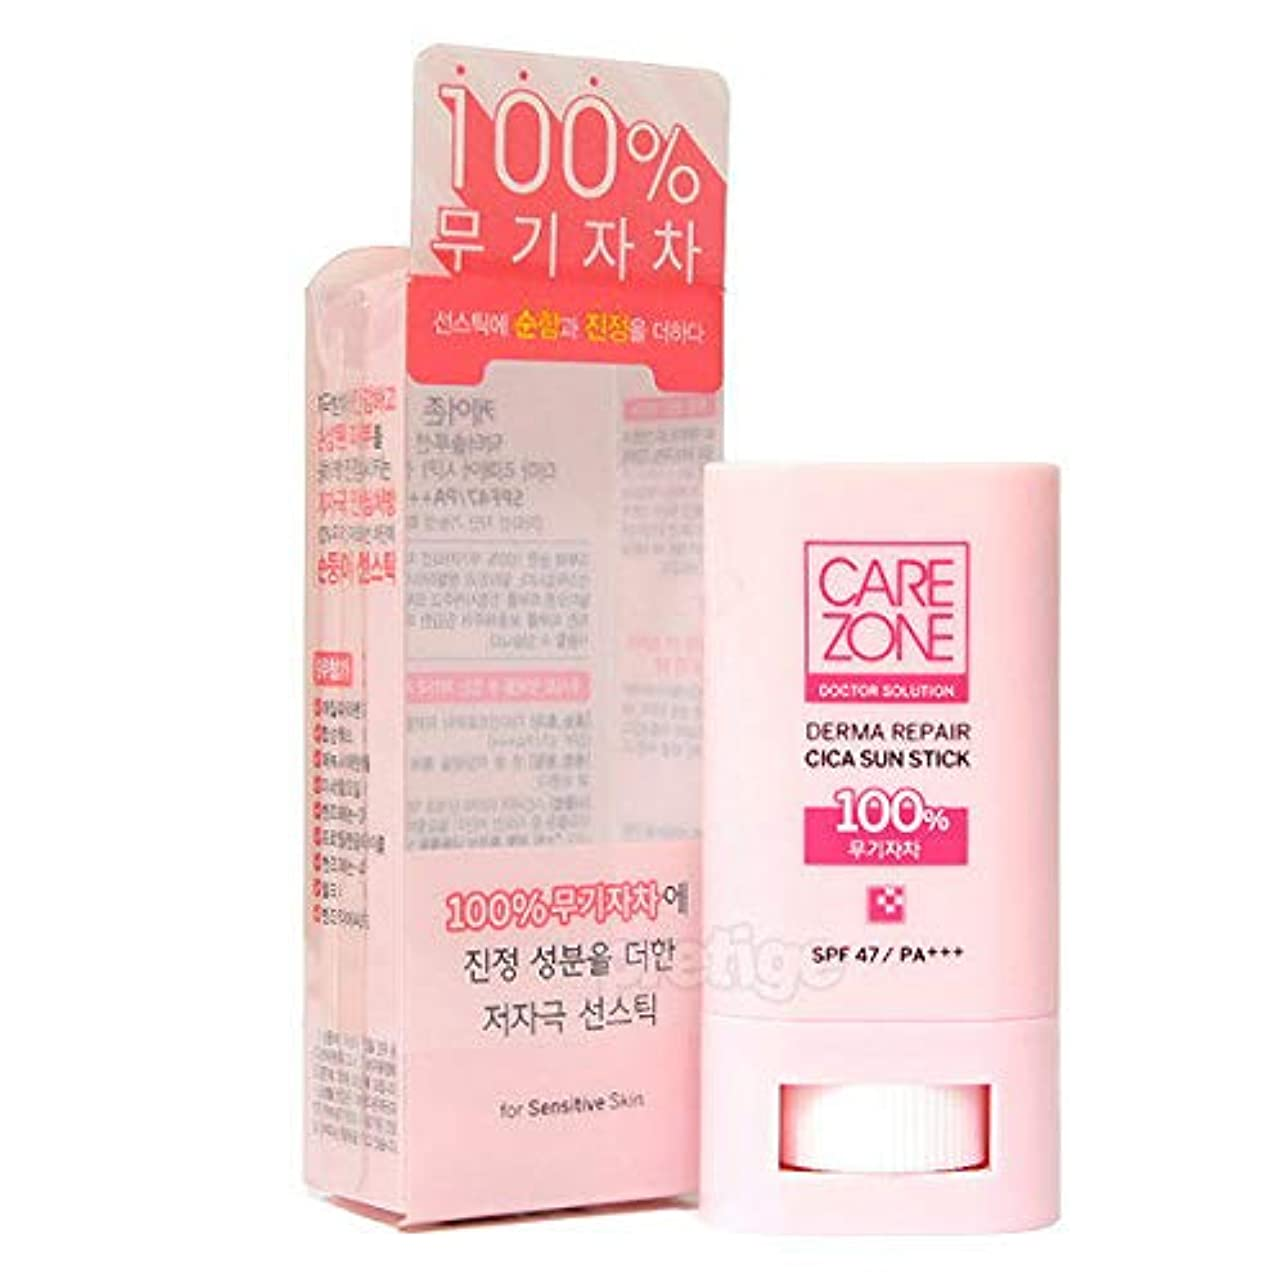 CAREZONE ケアゾーン Doctor Solution Derma Repair Cica Sun Stick サンスティック (20g) SPF47/PA+++ CARE ZONE